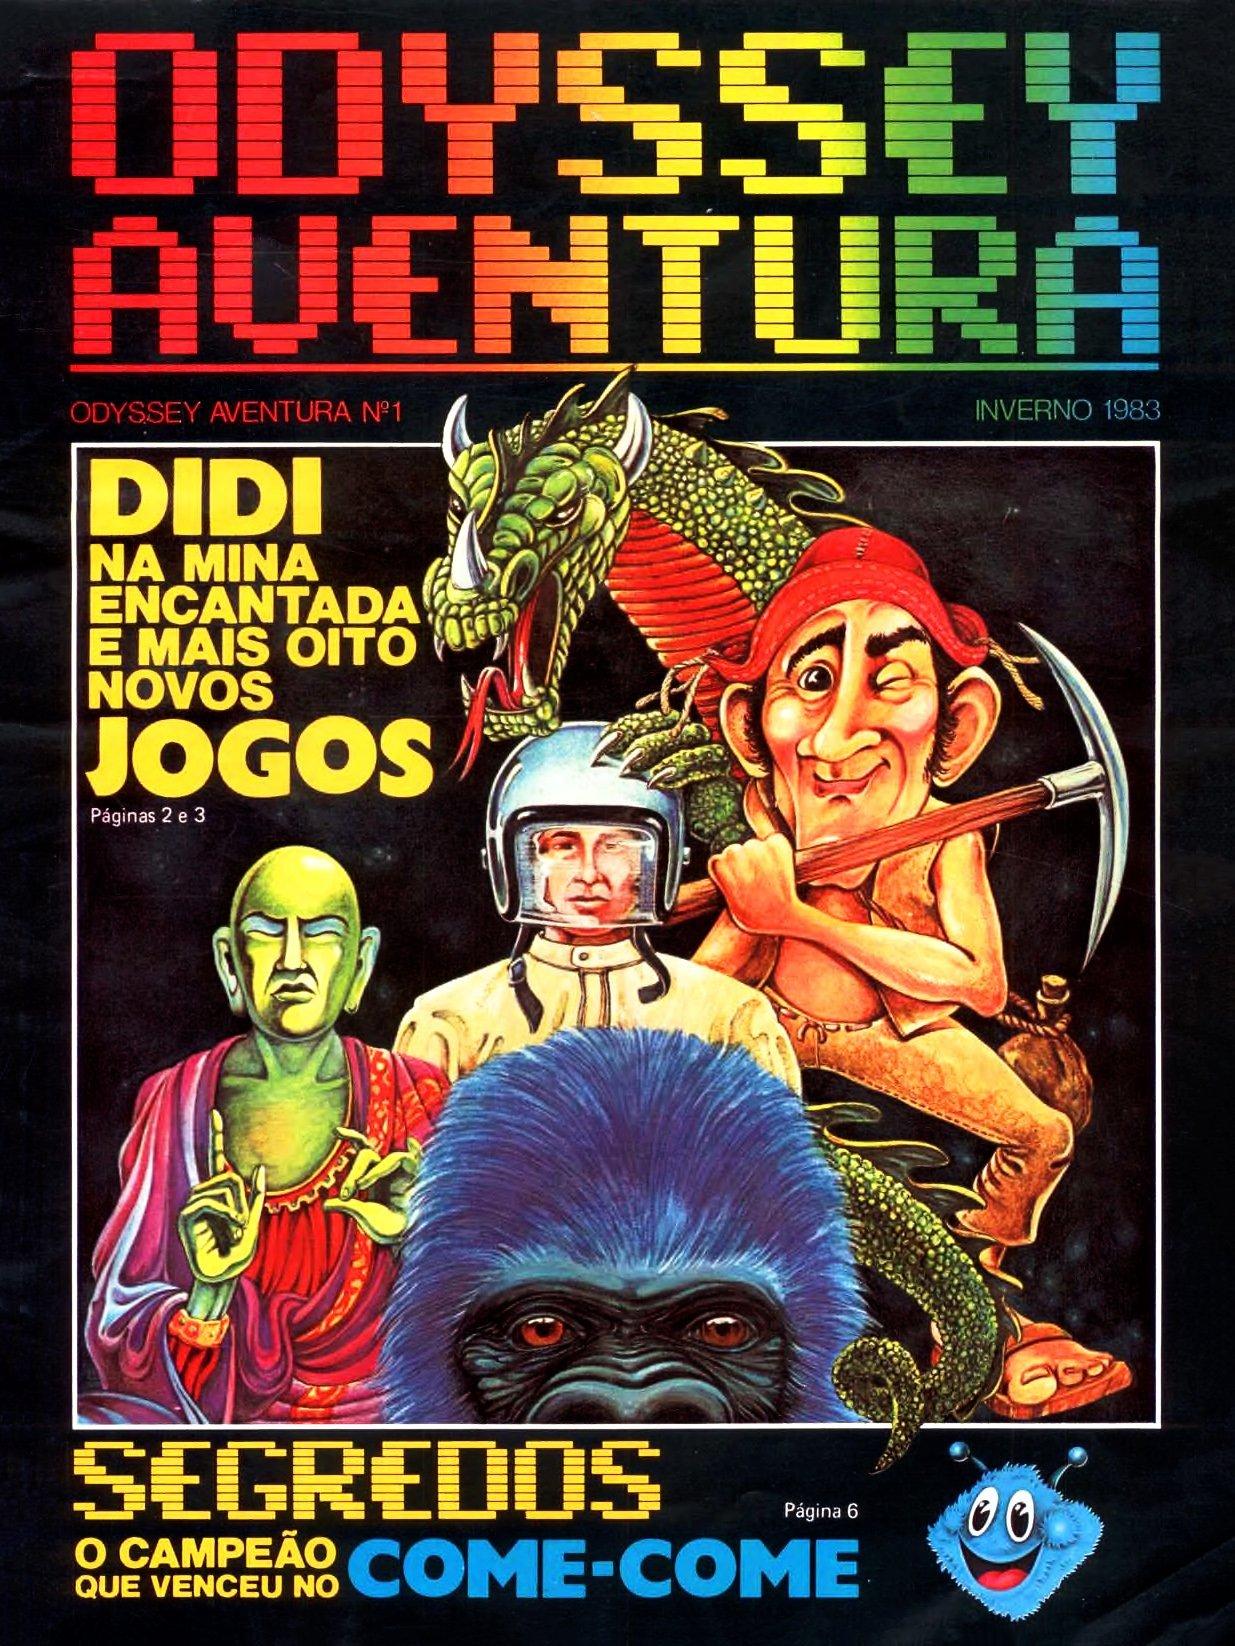 Odyssey Aventura Issue 1 (Winter 1983)